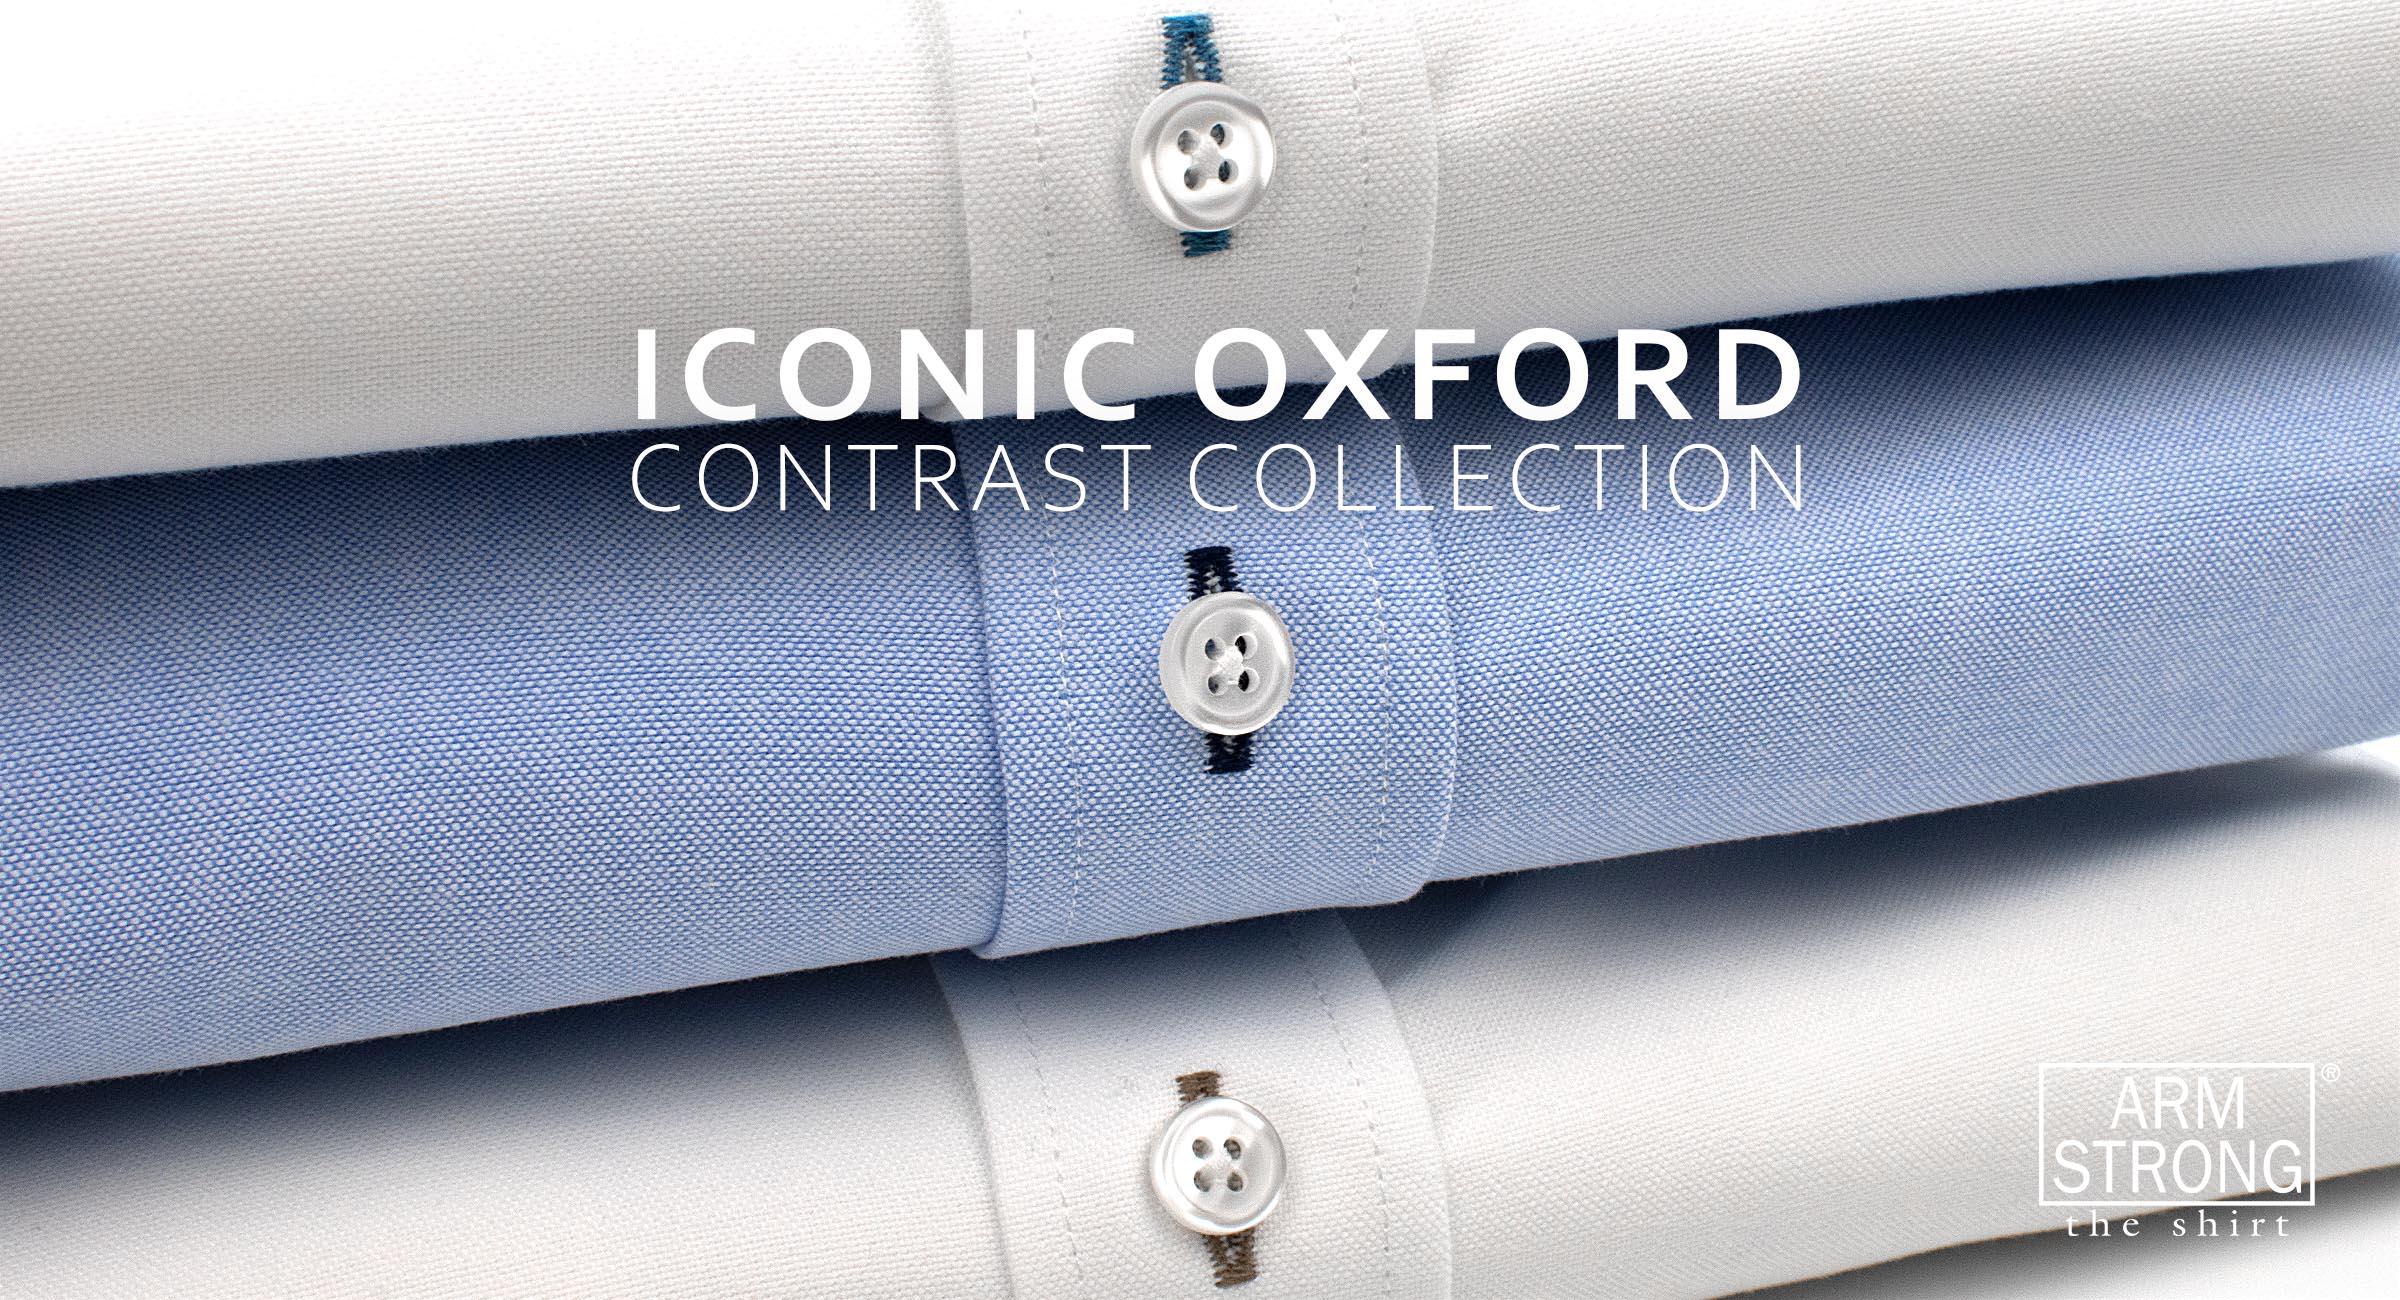 Iconic Oxford